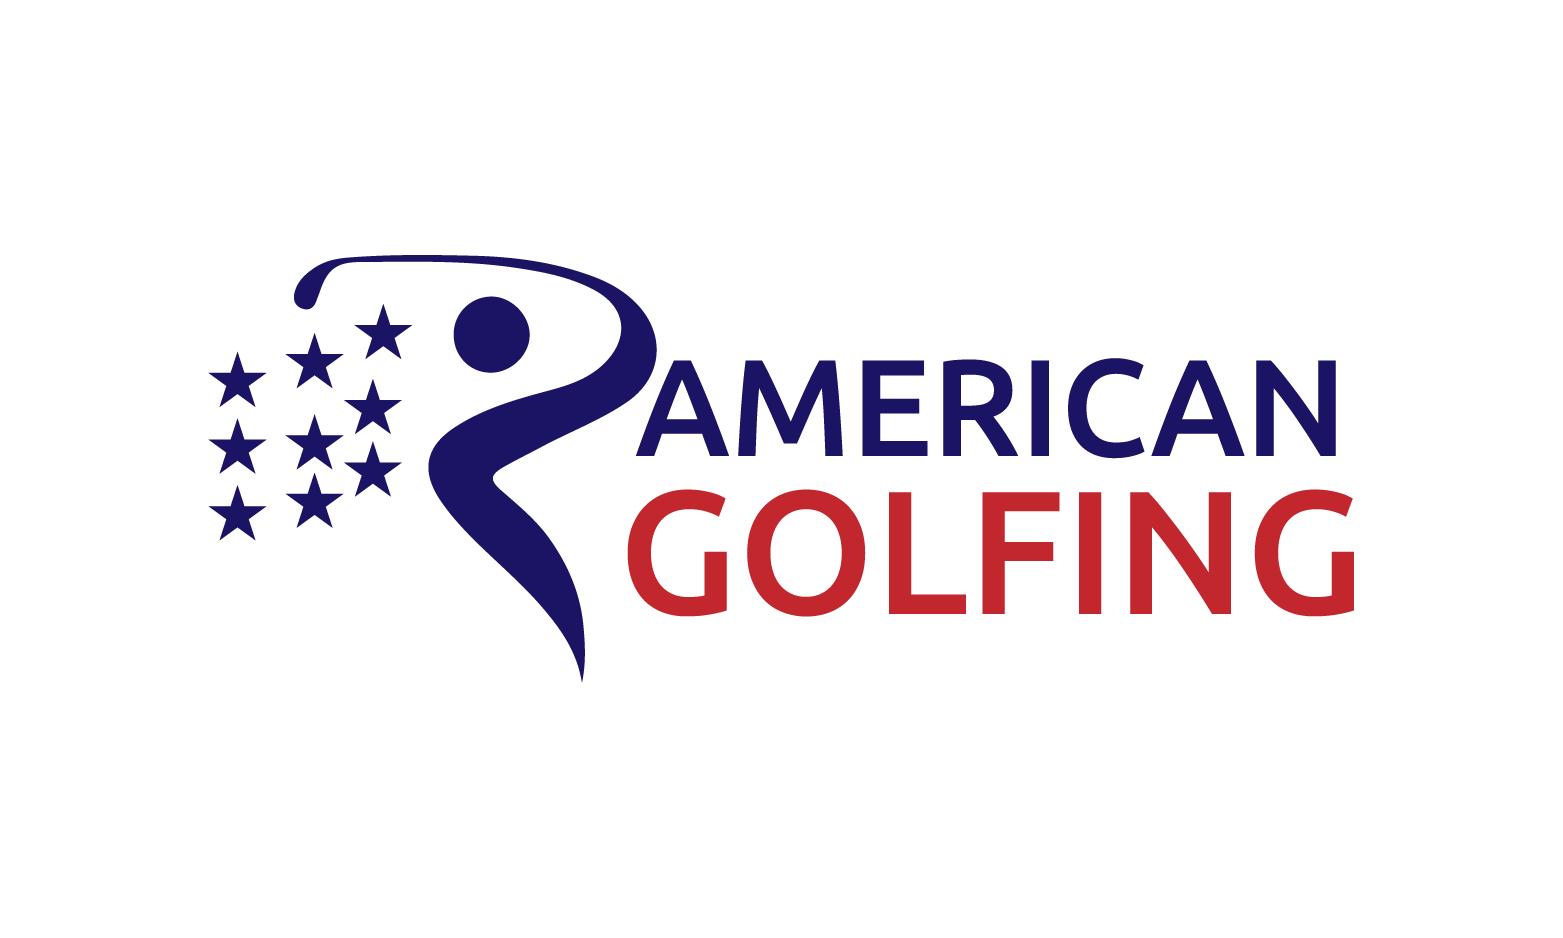 AmericanGolfing.com